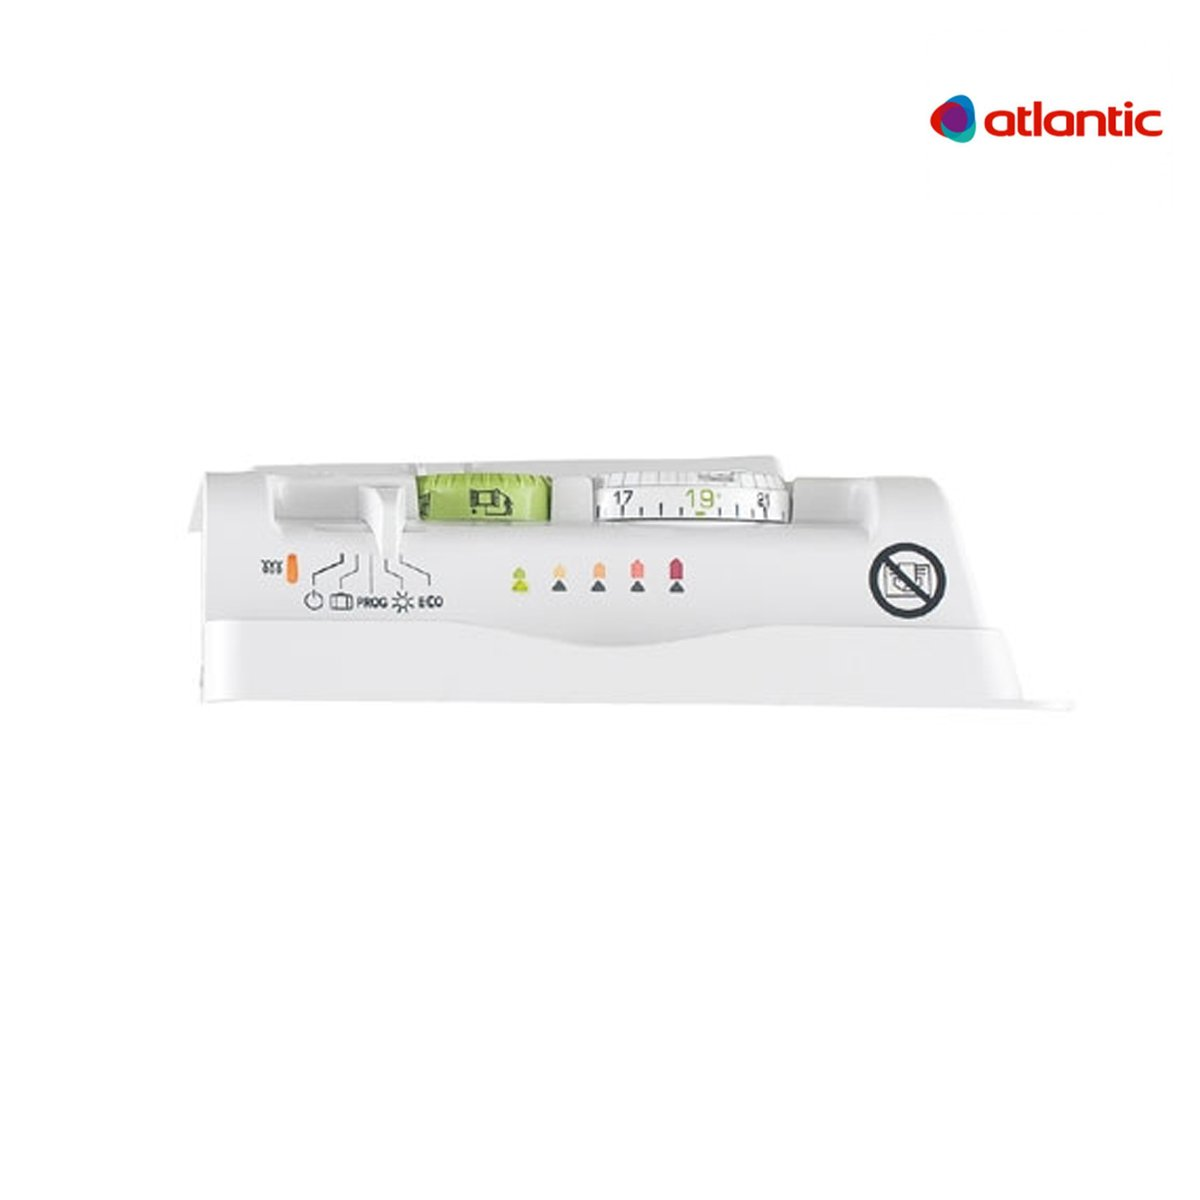 Electric Radiator Atlantic Solius Ecodomo 500 W Amazon Co Uk Diy